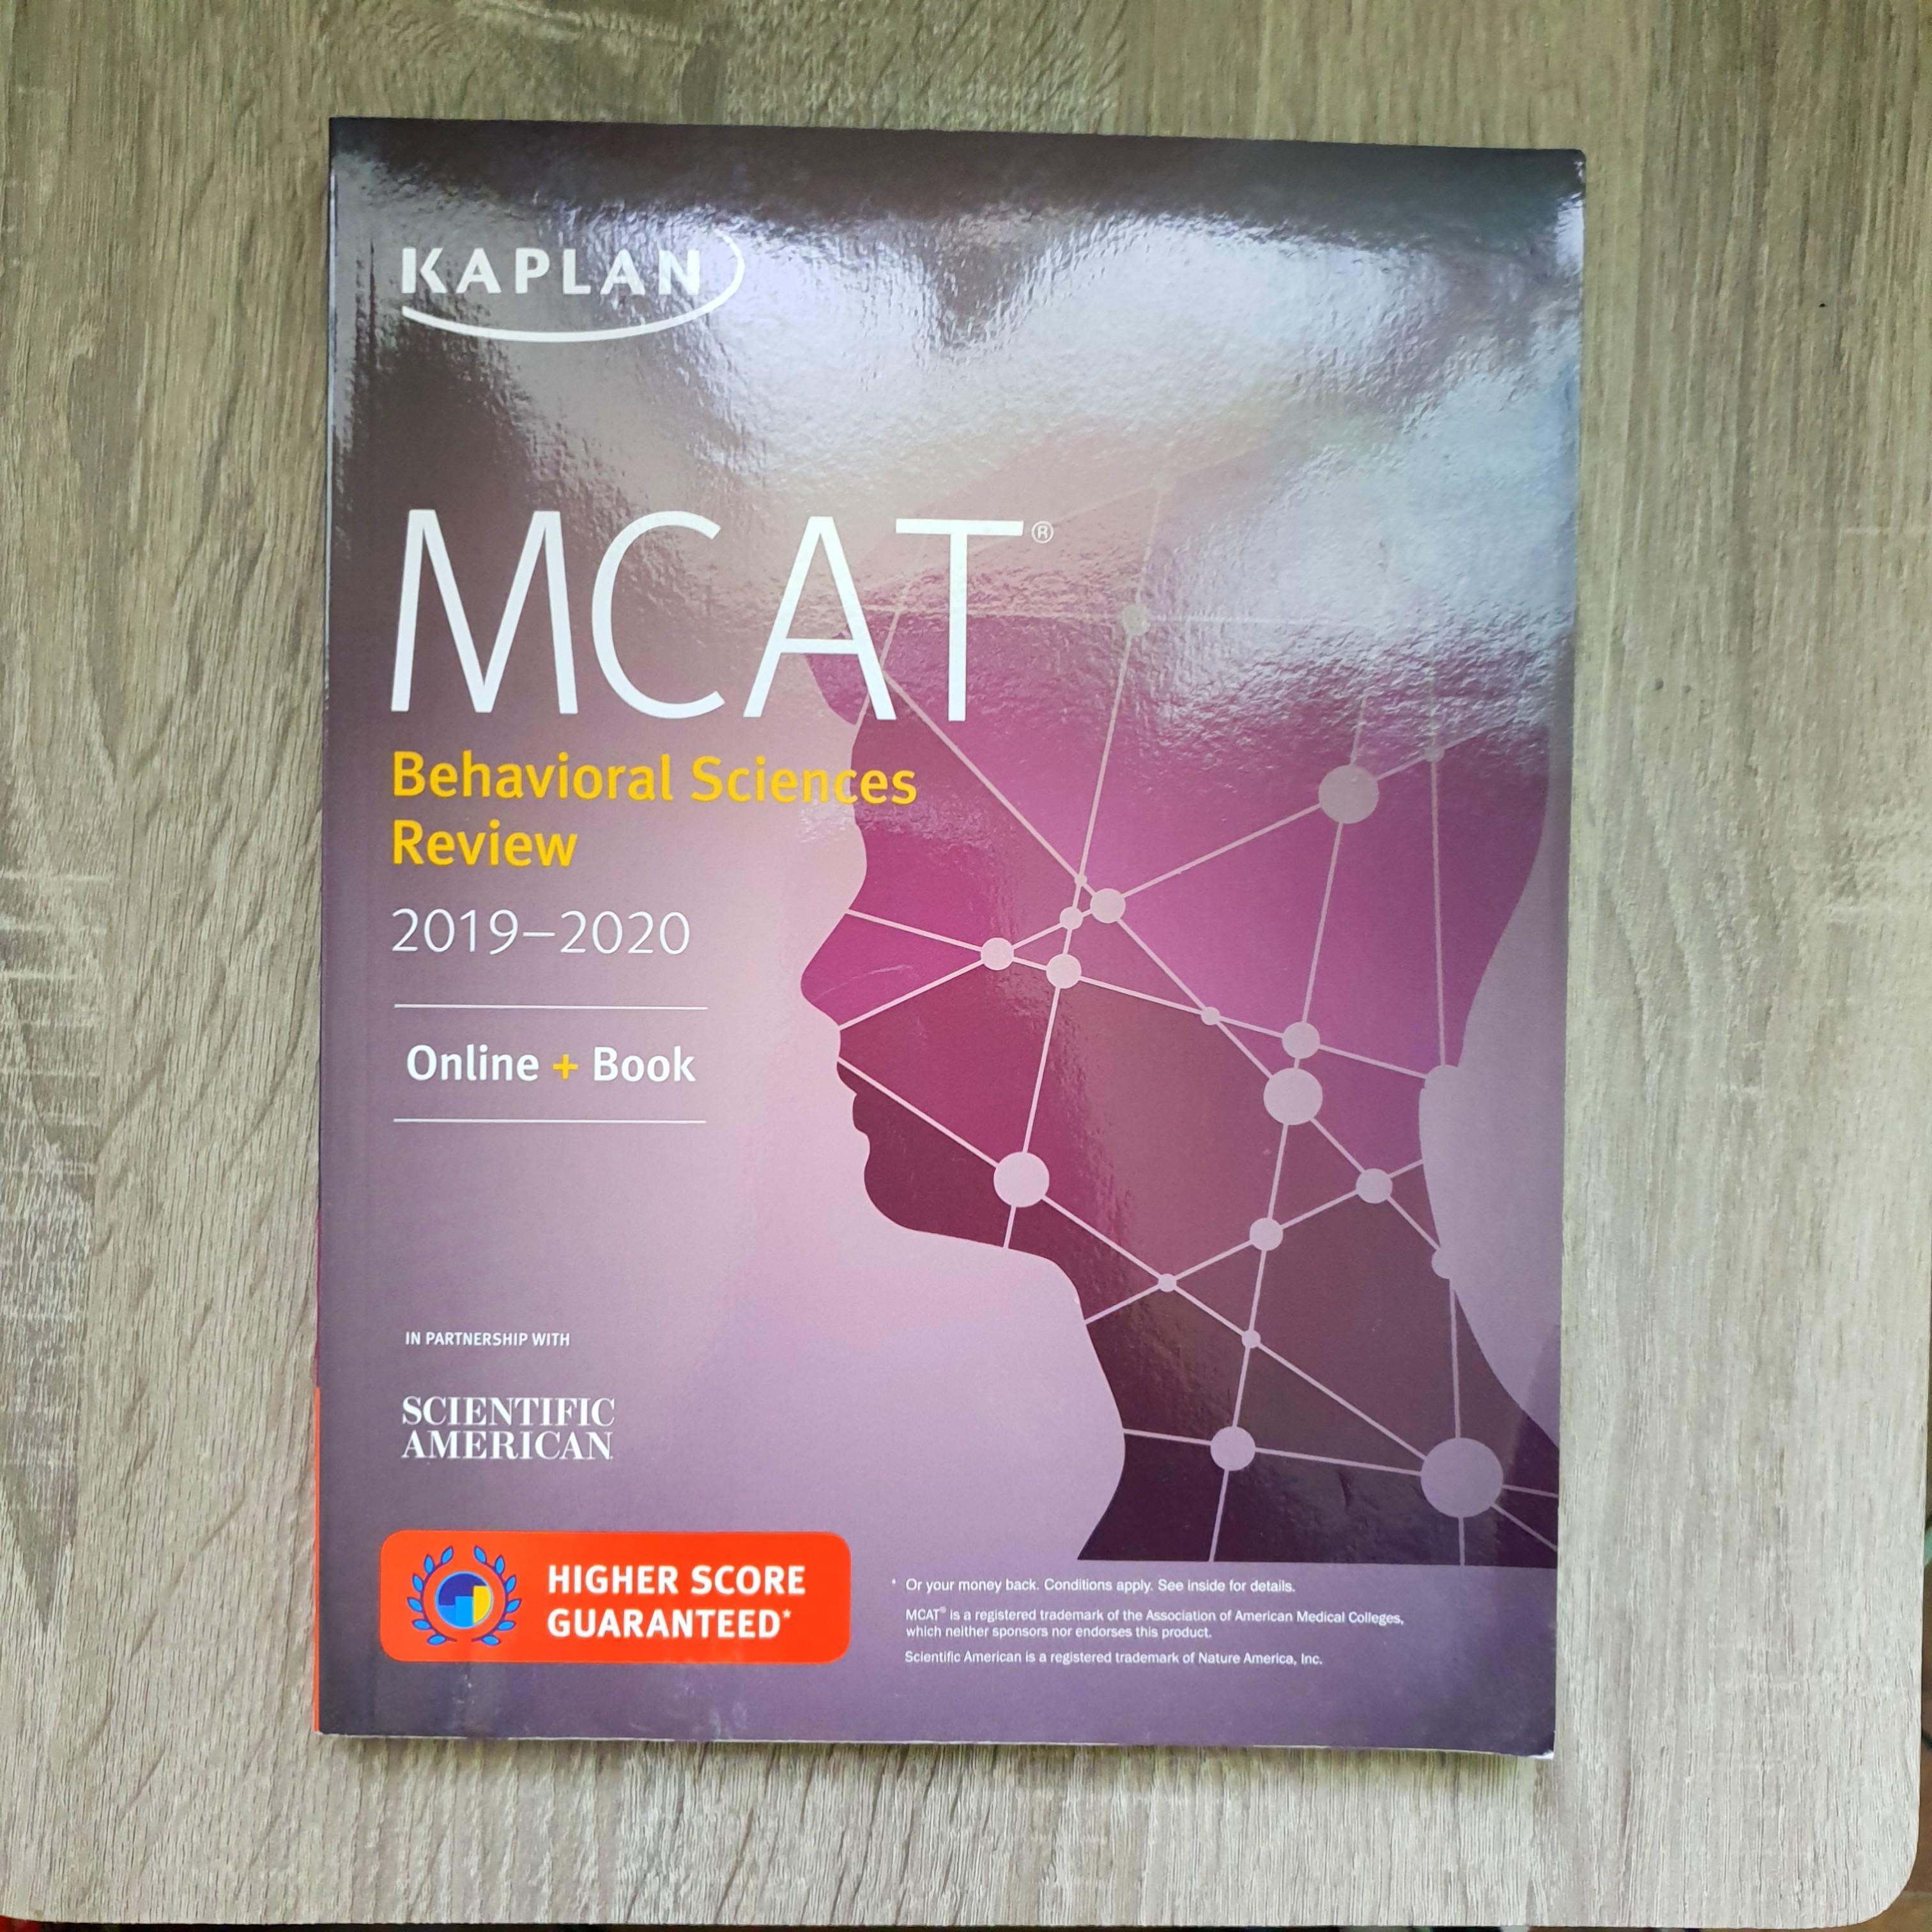 MCAT Behavioral Science Reviewer 2019-2020 (Kaplan)